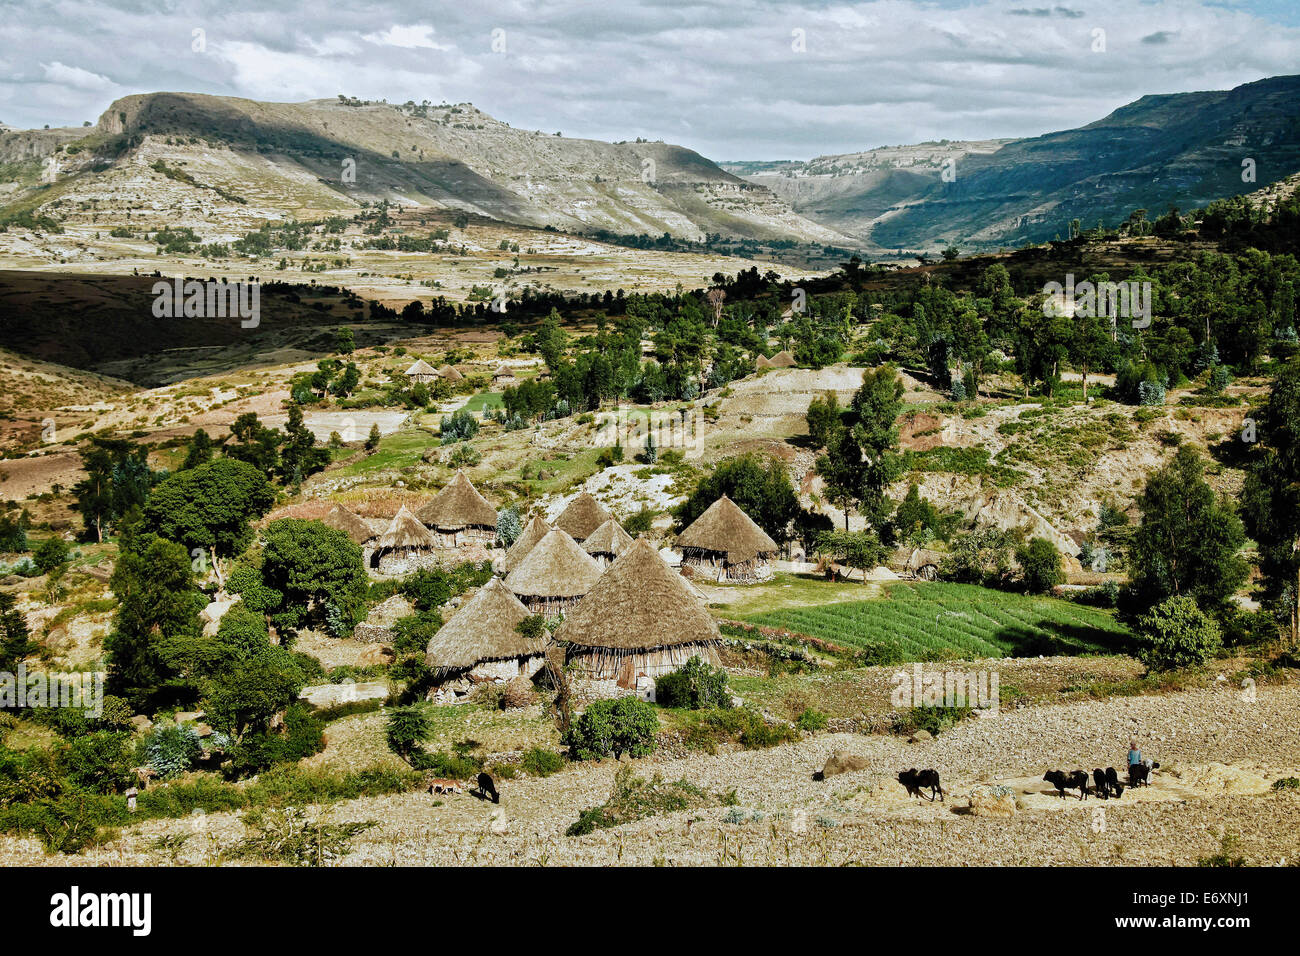 Landscape in the Ethiopian Highlands, Ethiopia, Africa - Stock Image